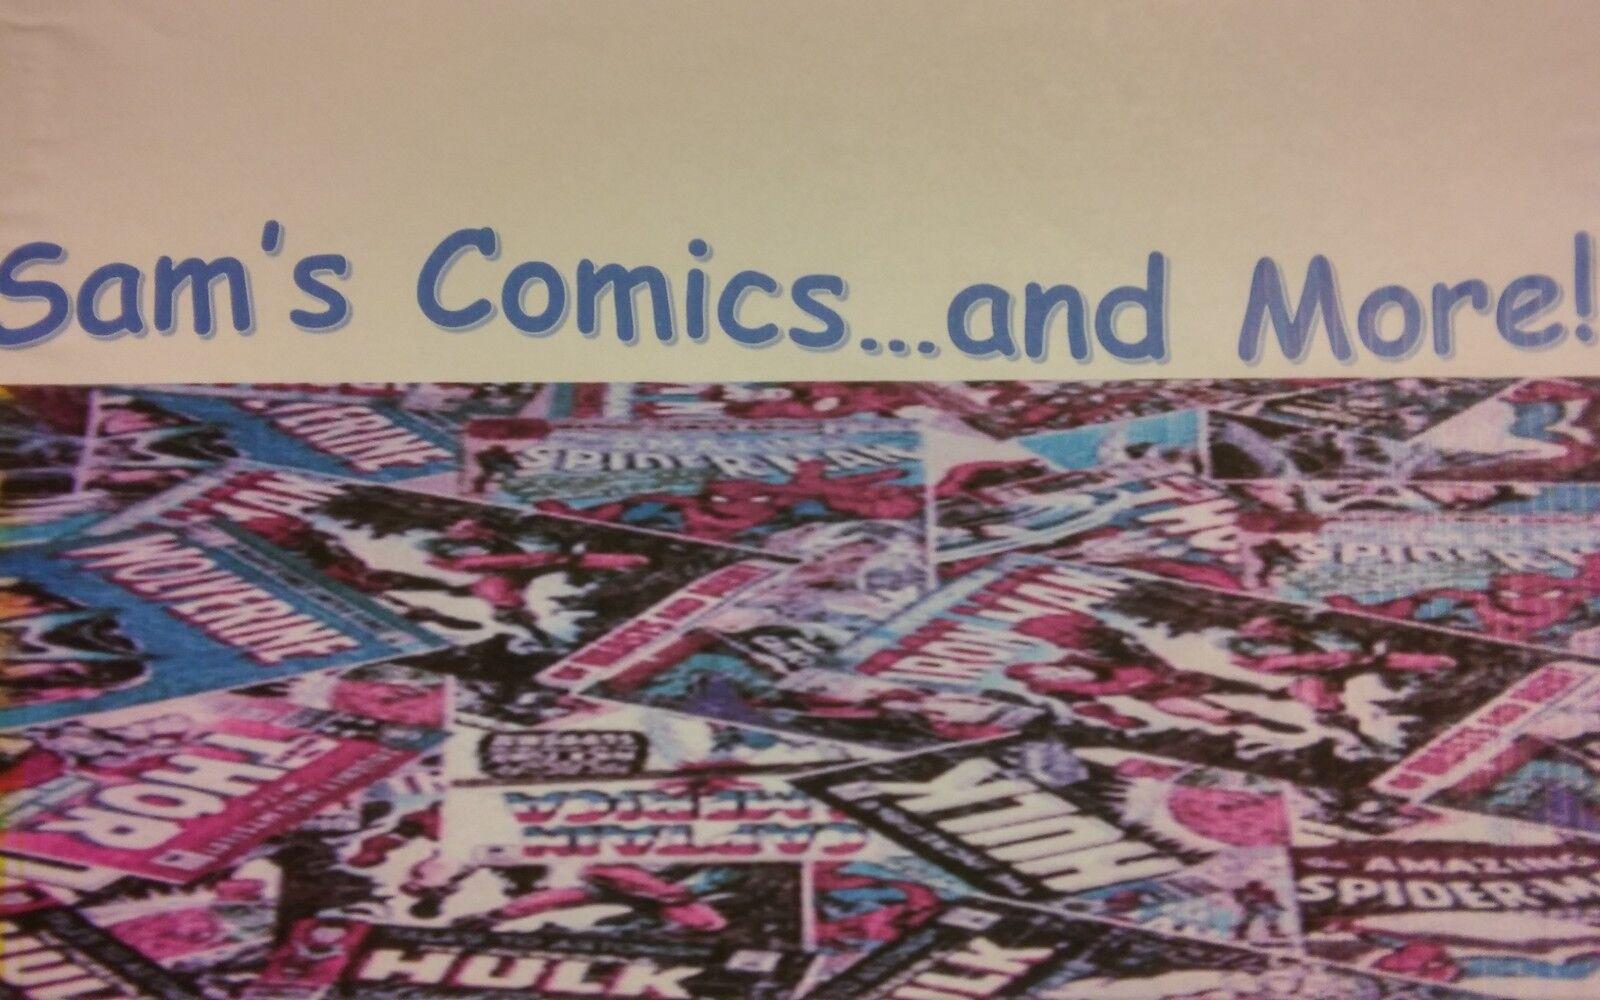 Sam's Comics and More